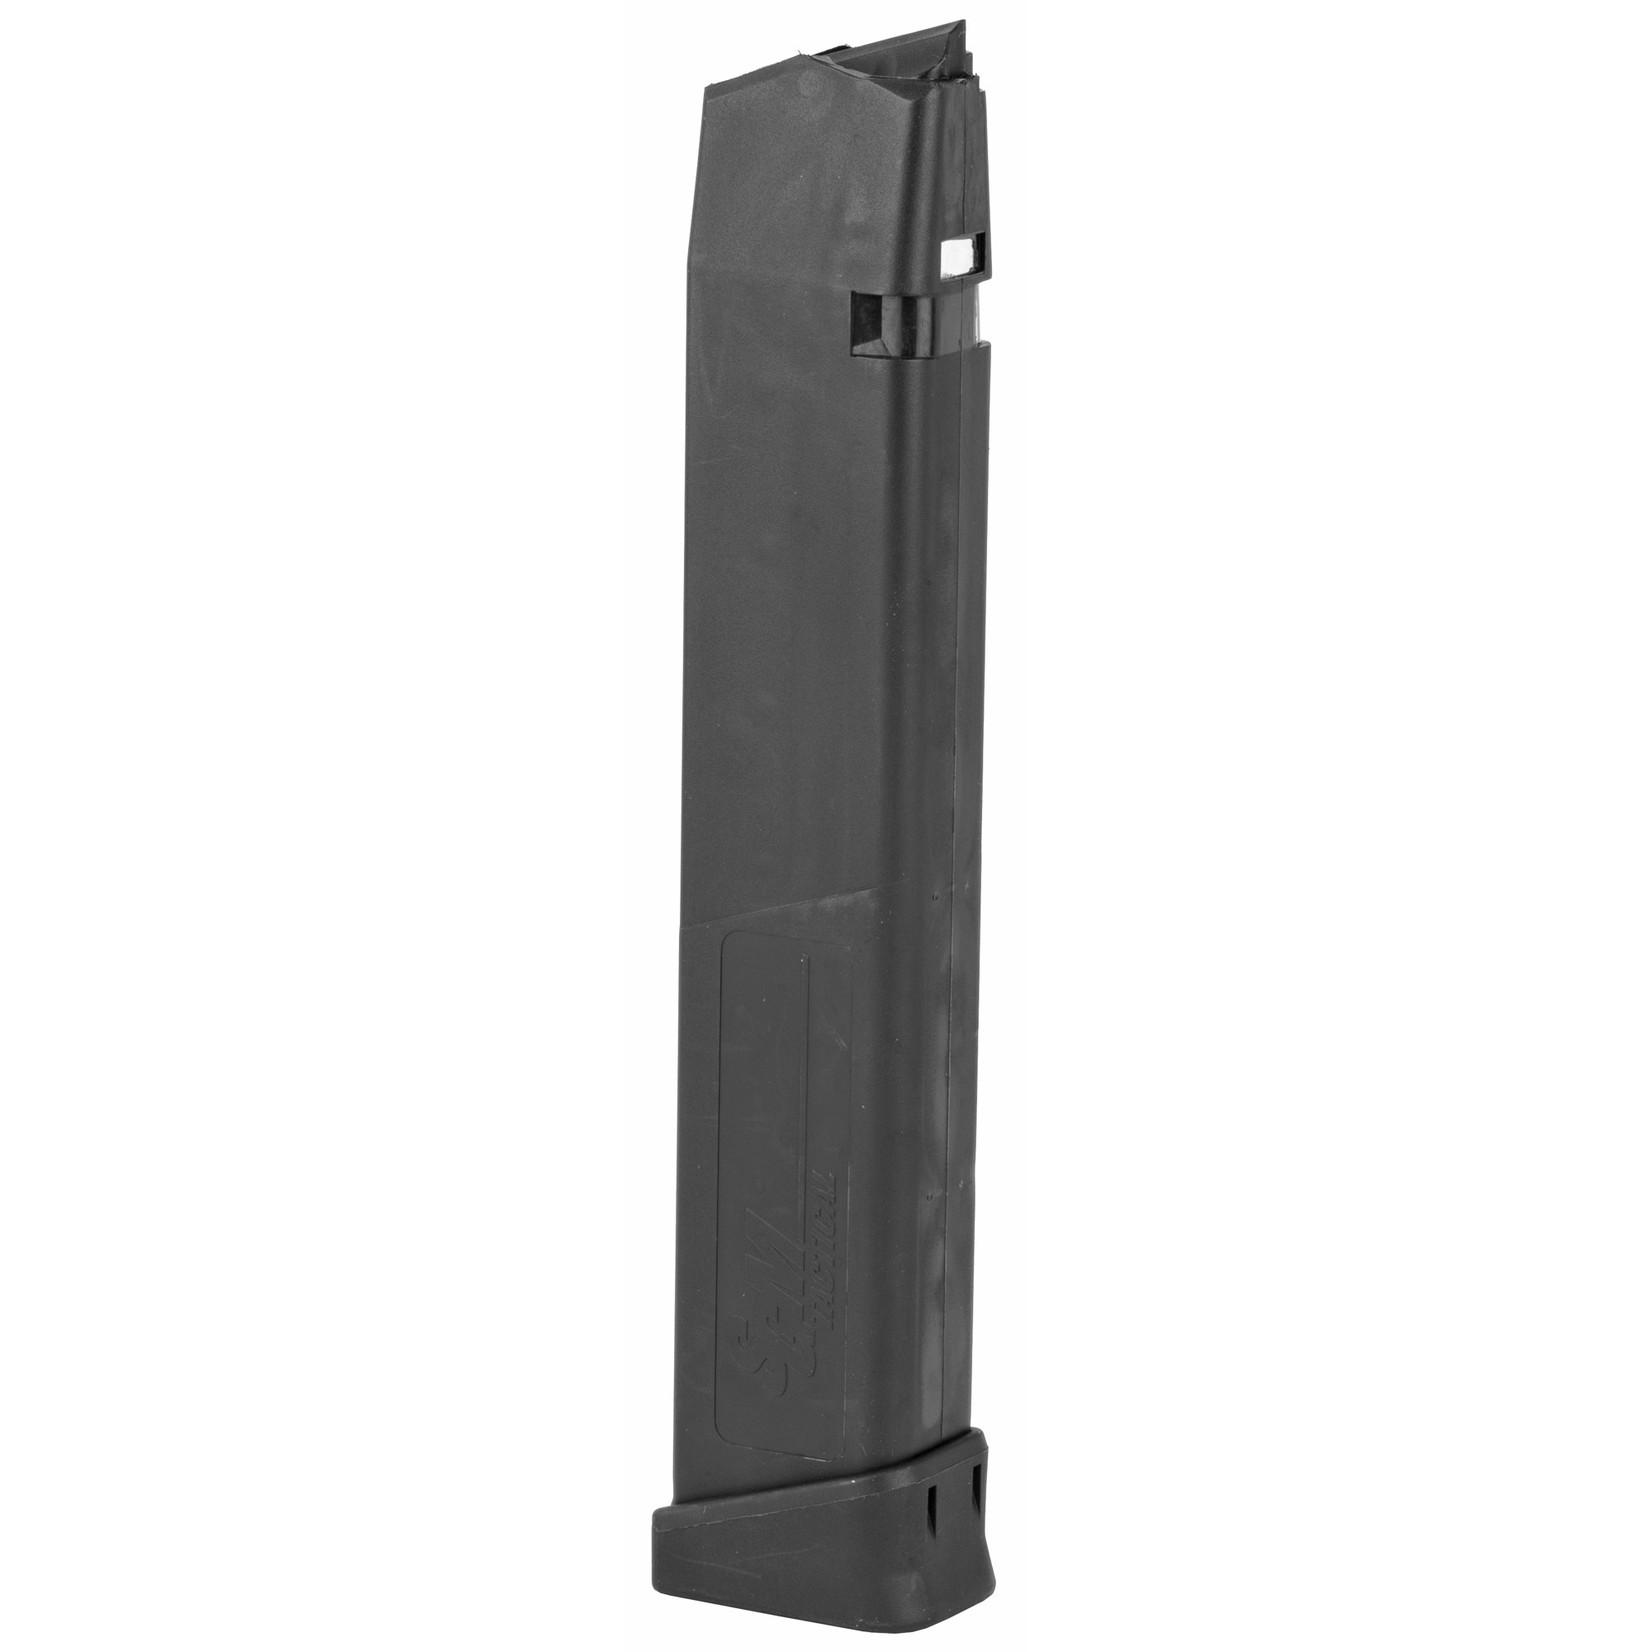 SGM Tactical SGM Tact GLOCK21 45ACP 26RD